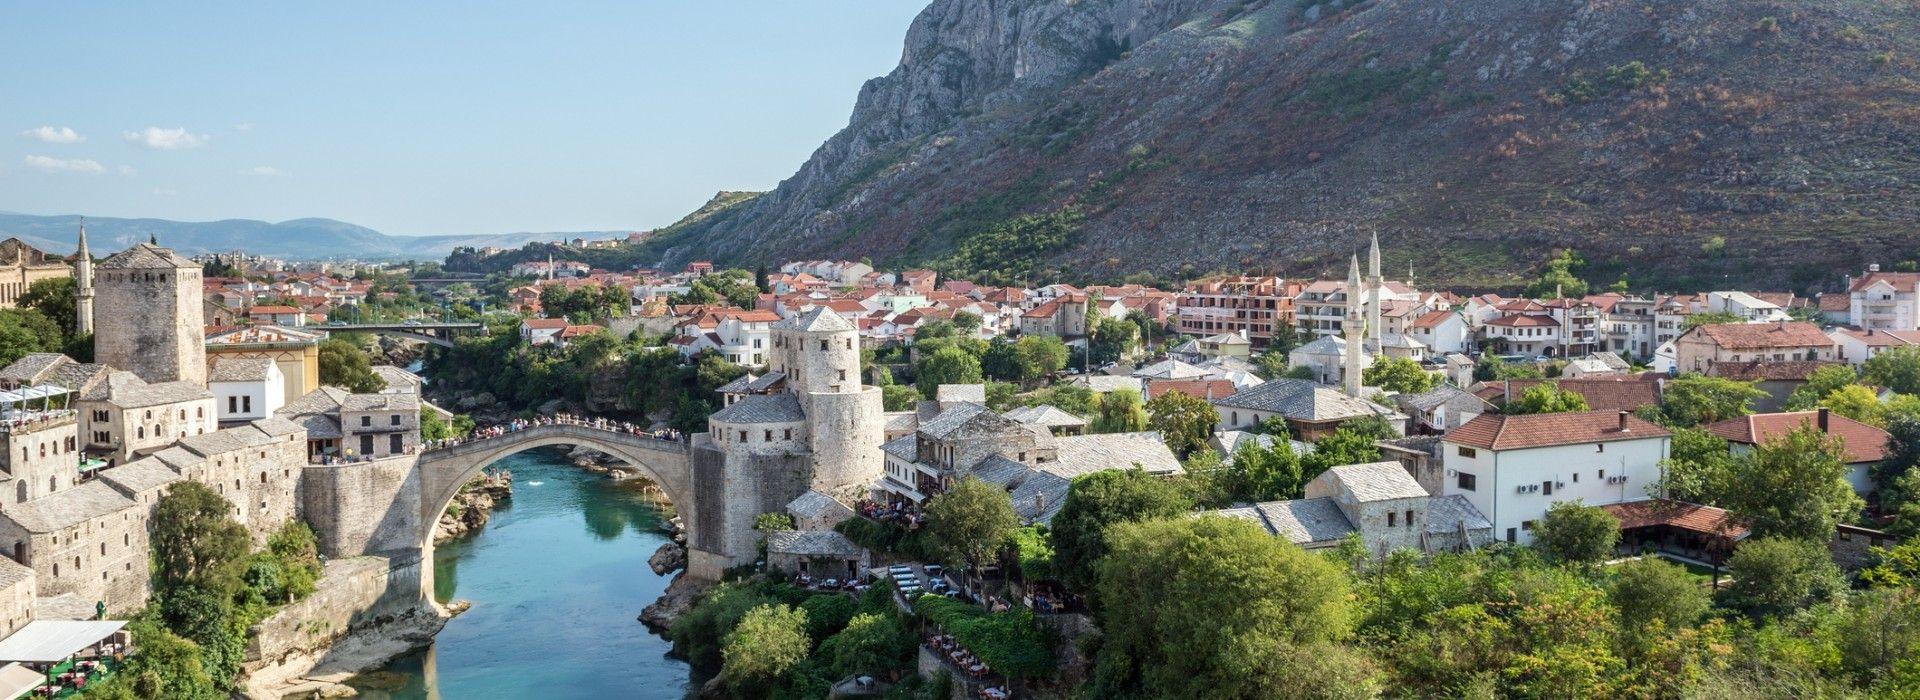 Bosnia Herzegovina Tours and Trips to Bosnia Herzegovina